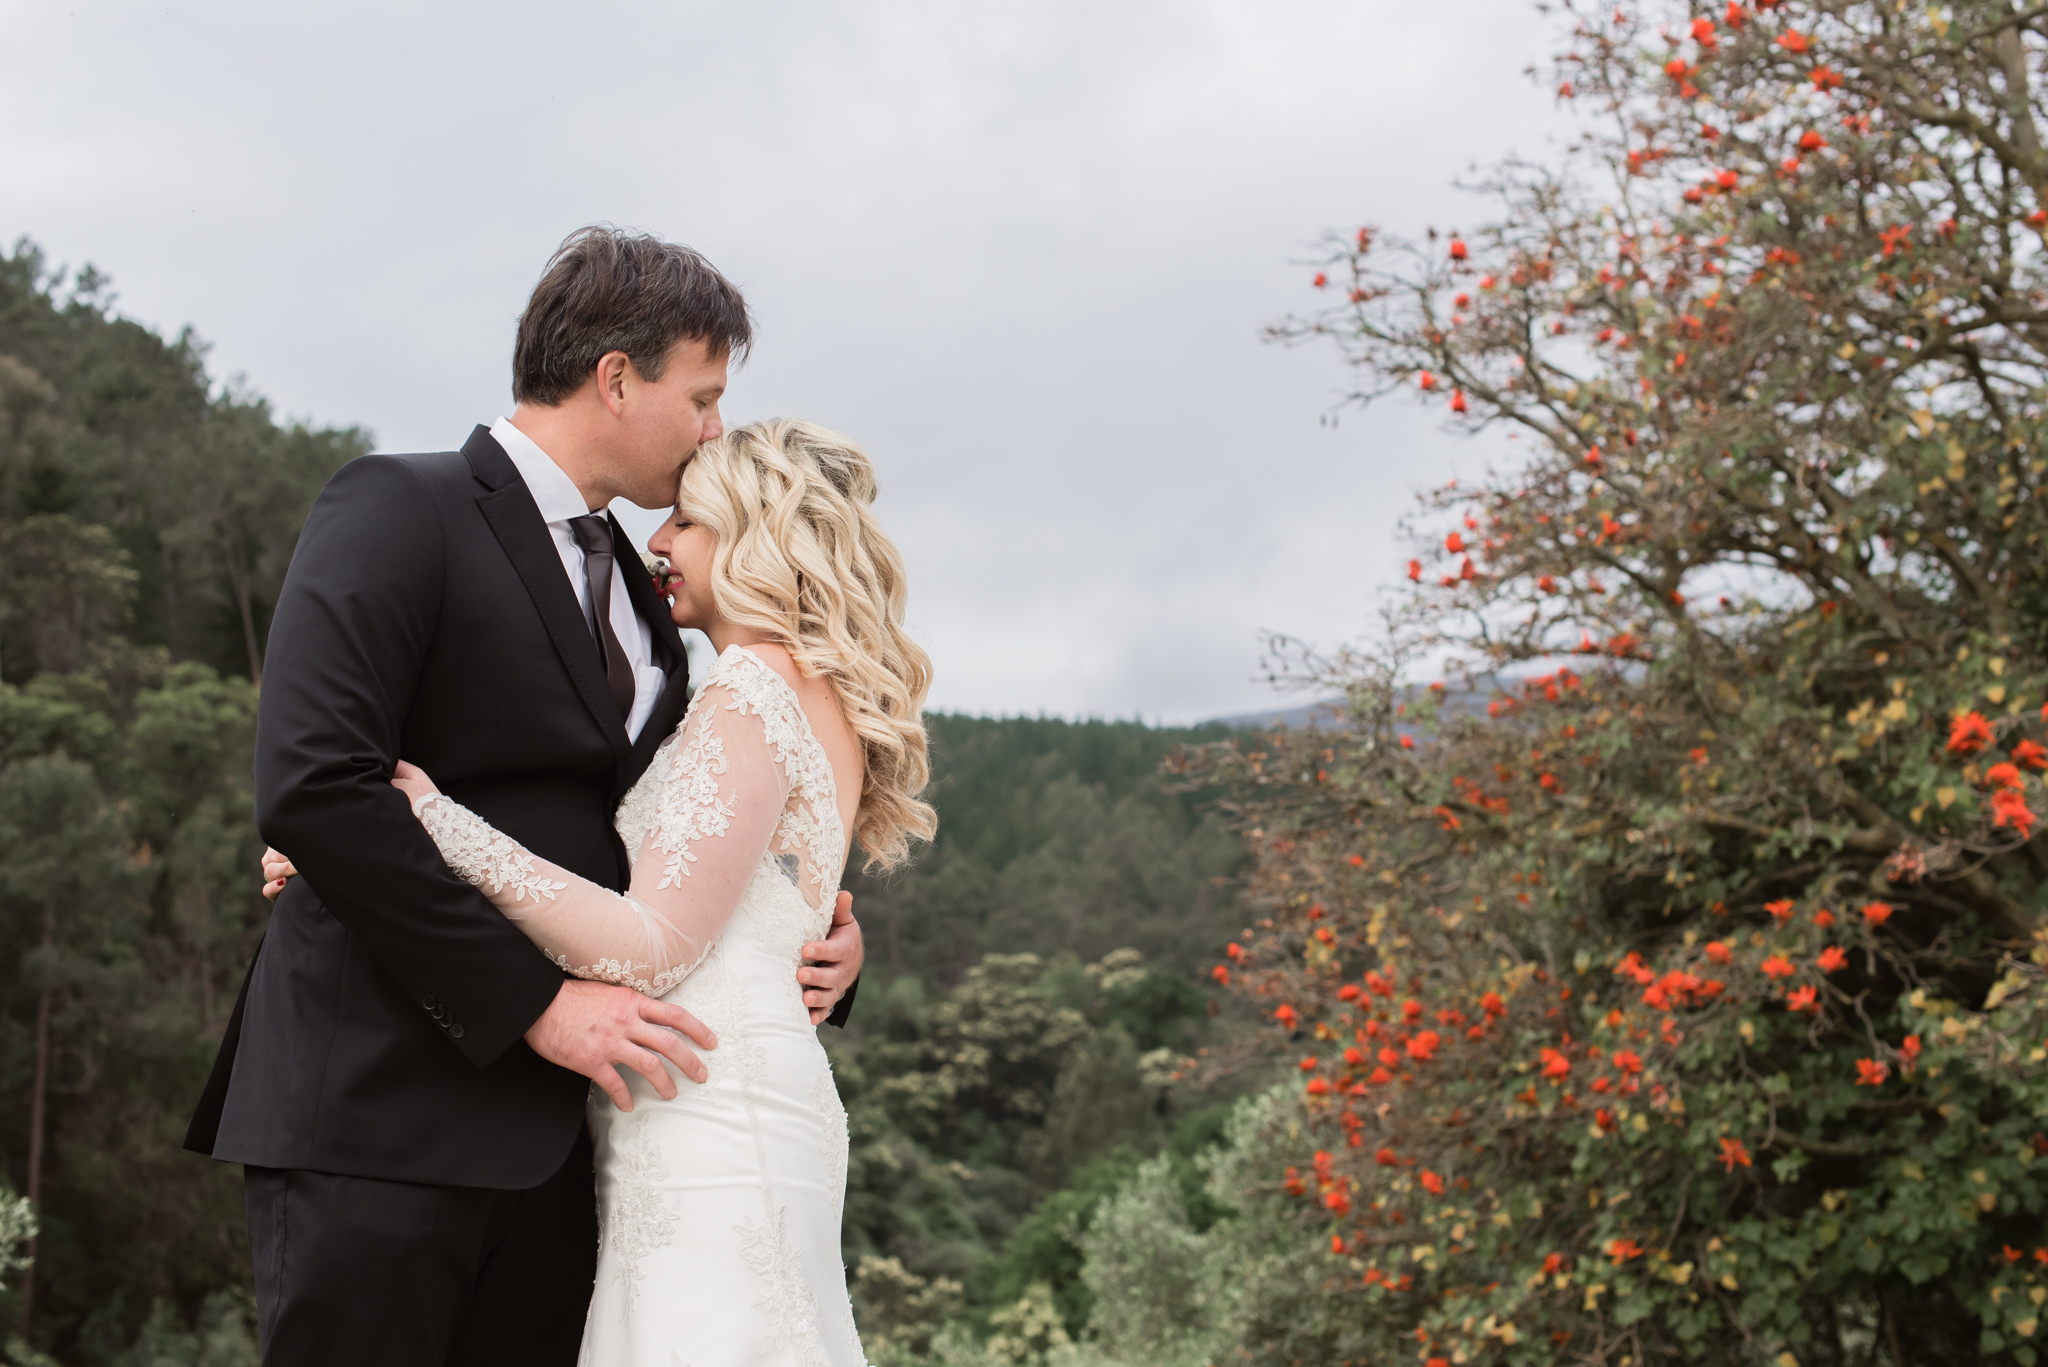 Angelique_Smith_Photography_Pieter&Yvonne_Wedding-474.jpg